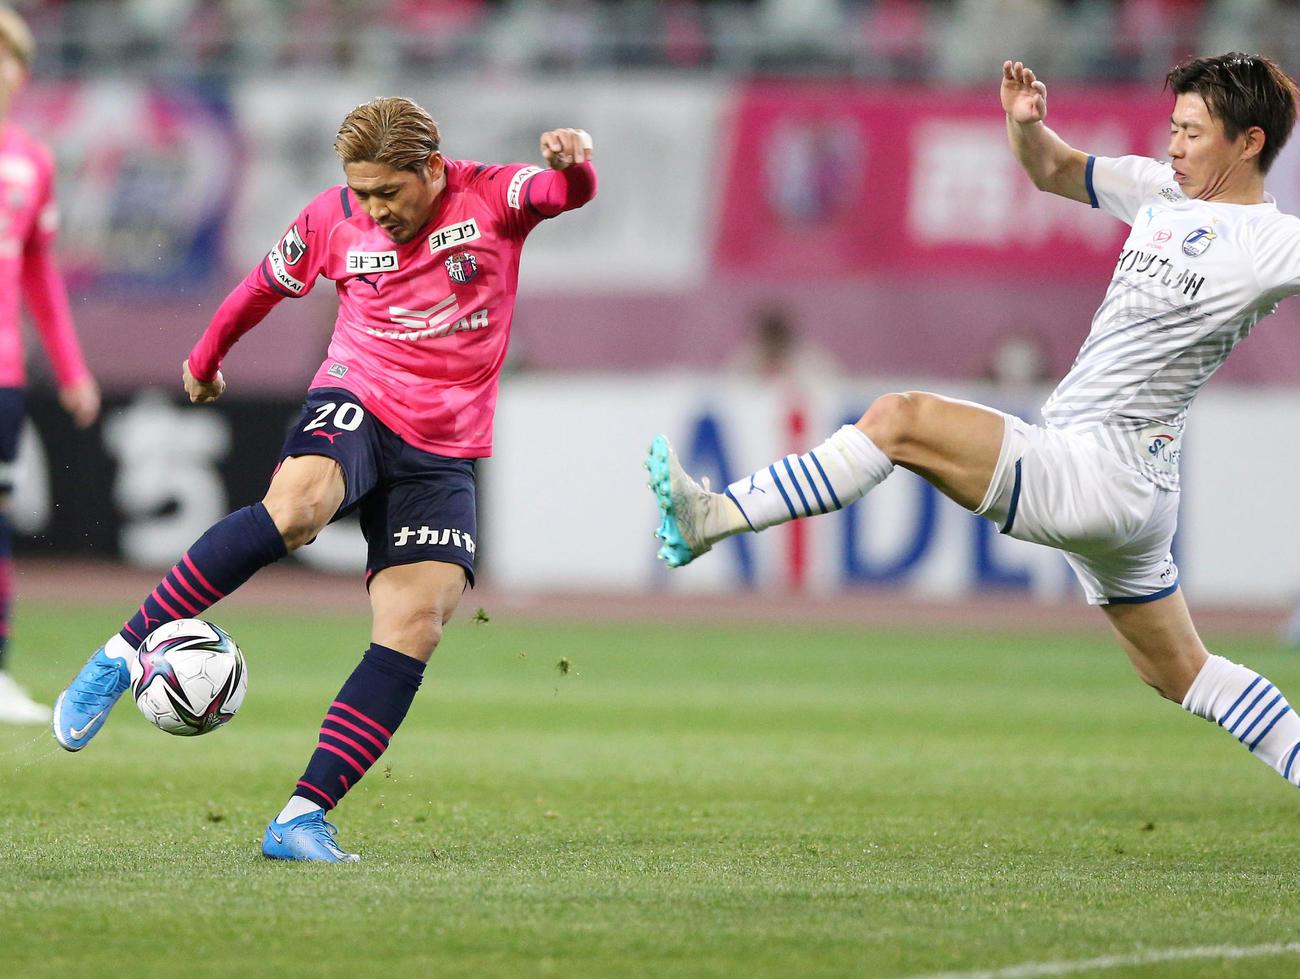 C大阪対大分 前半、C大阪FW大久保(左)はシュートを放つもゴールならず(撮影・上山淳一)